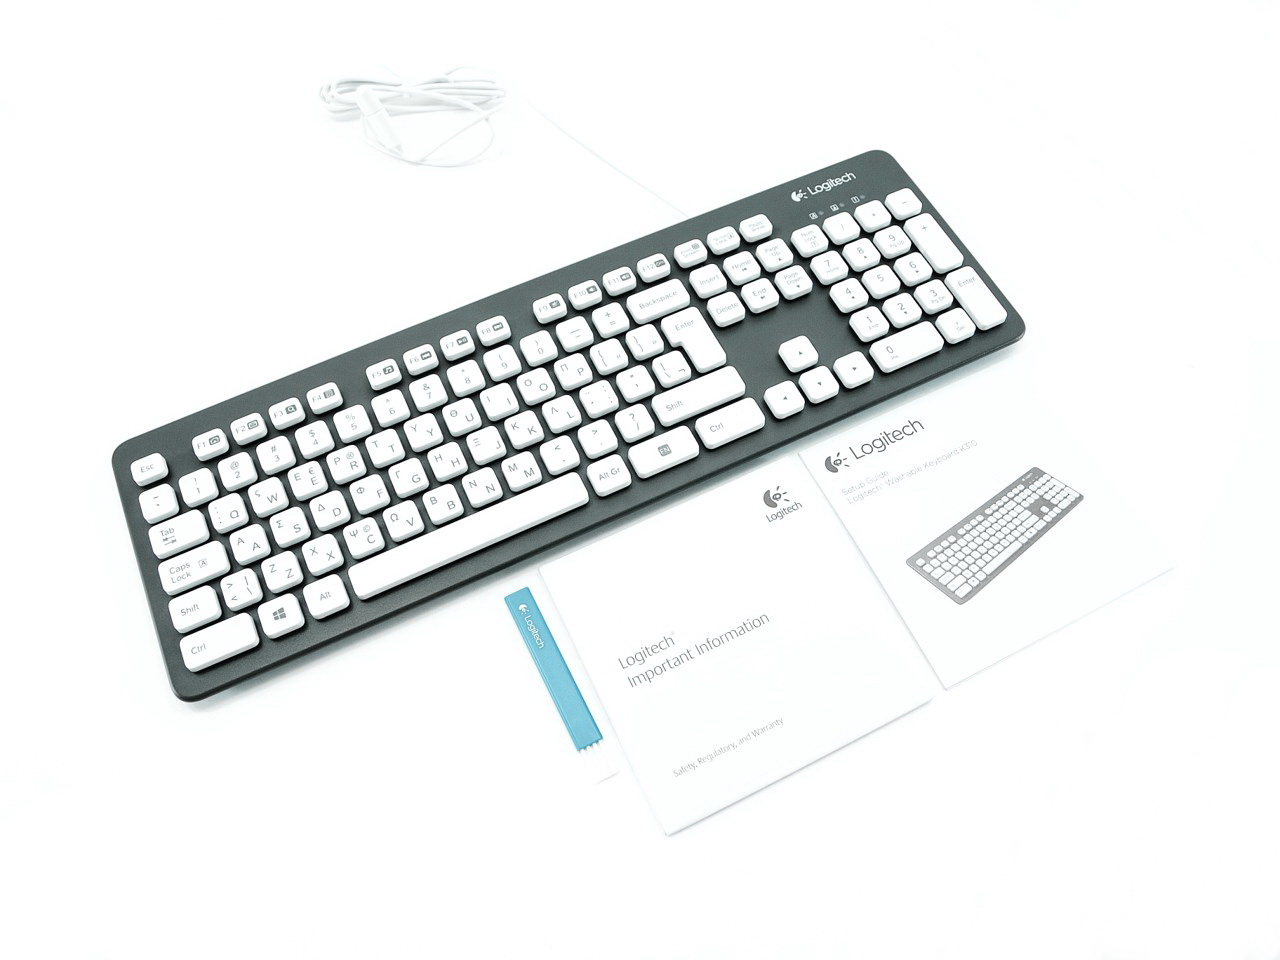 Logitech k310 Washable Keyboard Review